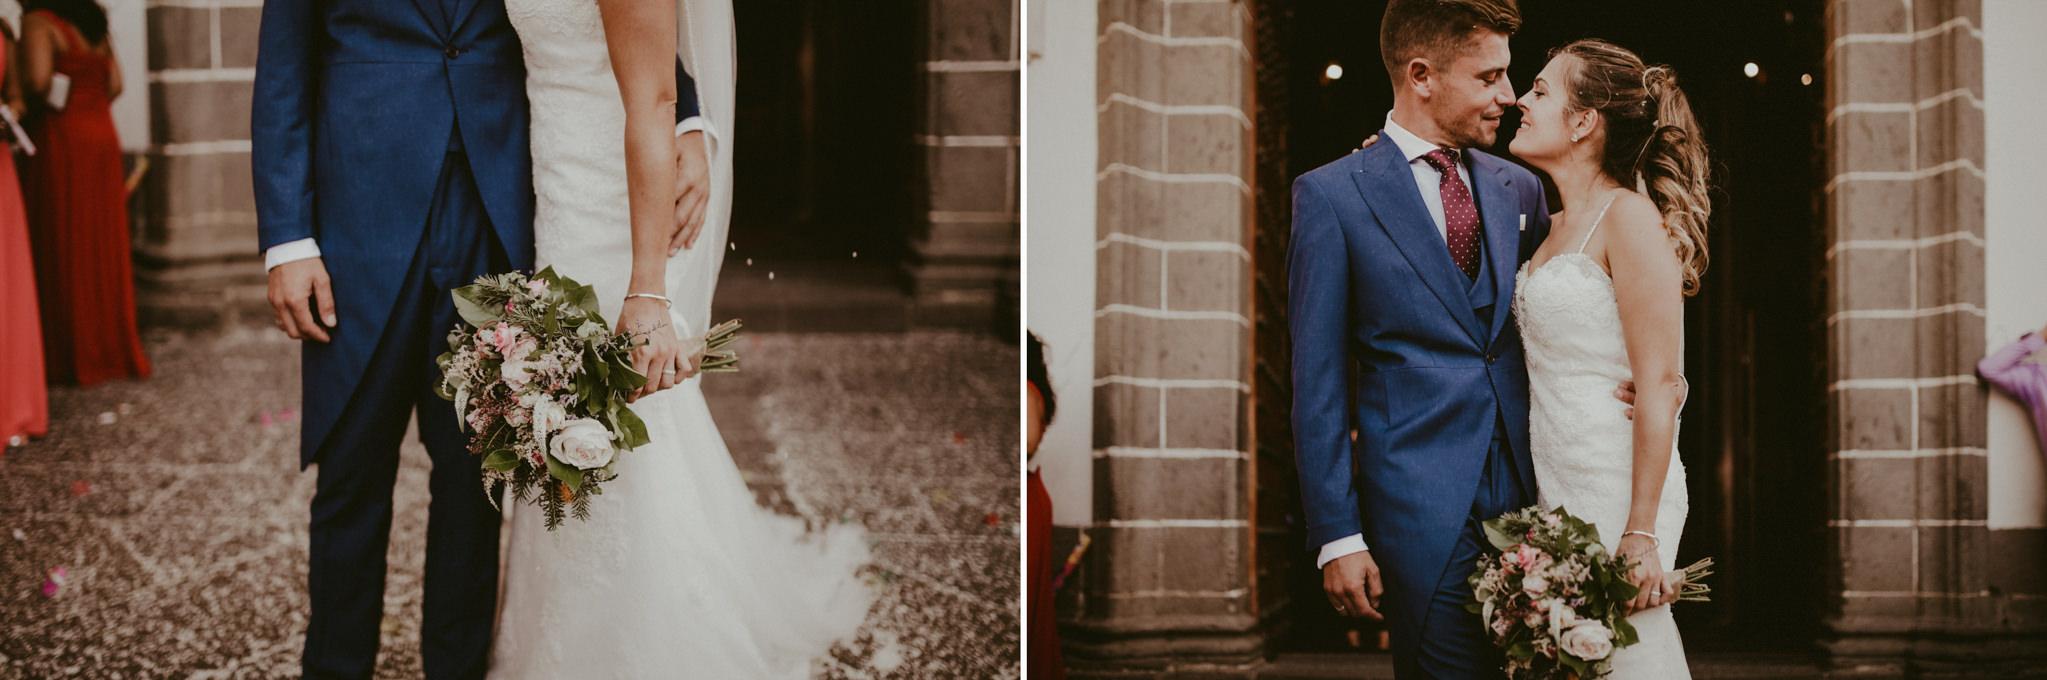 boda-diferente-fotografo-boda-laspalmas-grancanaria-112